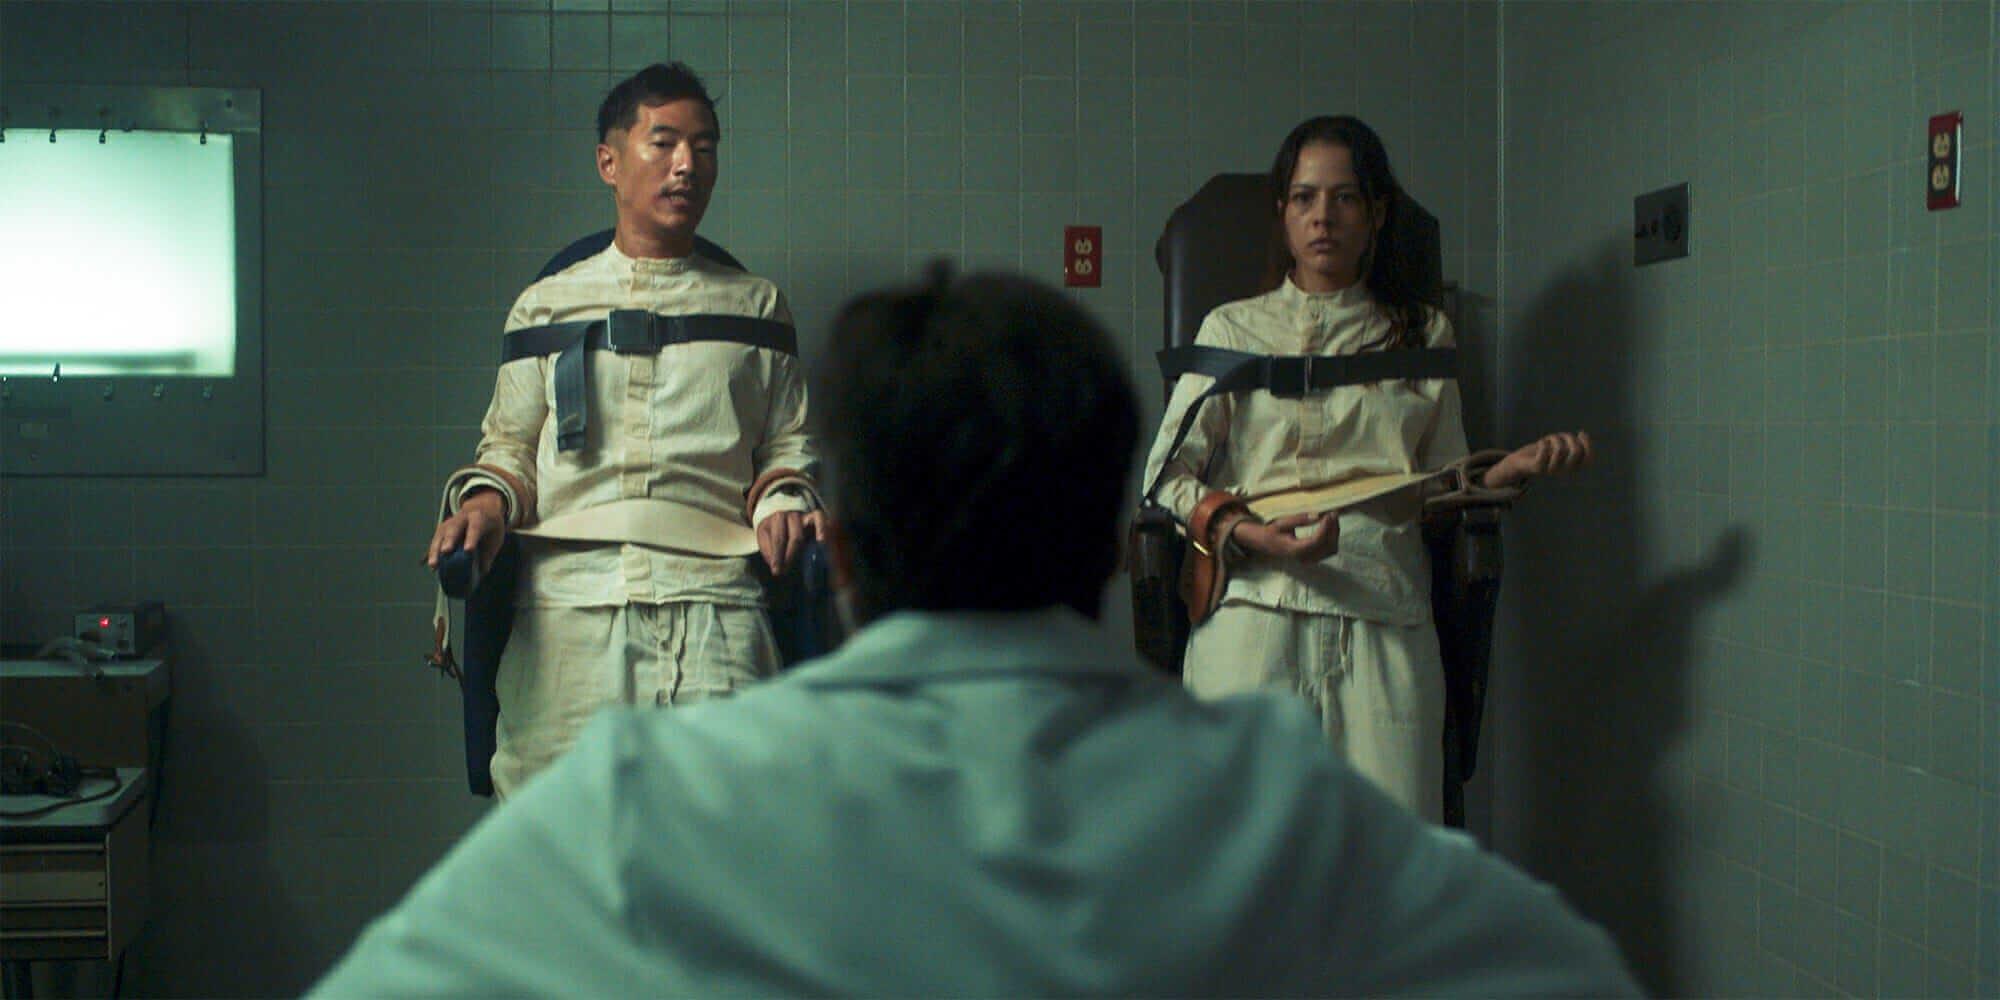 Phobias still featuring Leonardo Nam and Martina García